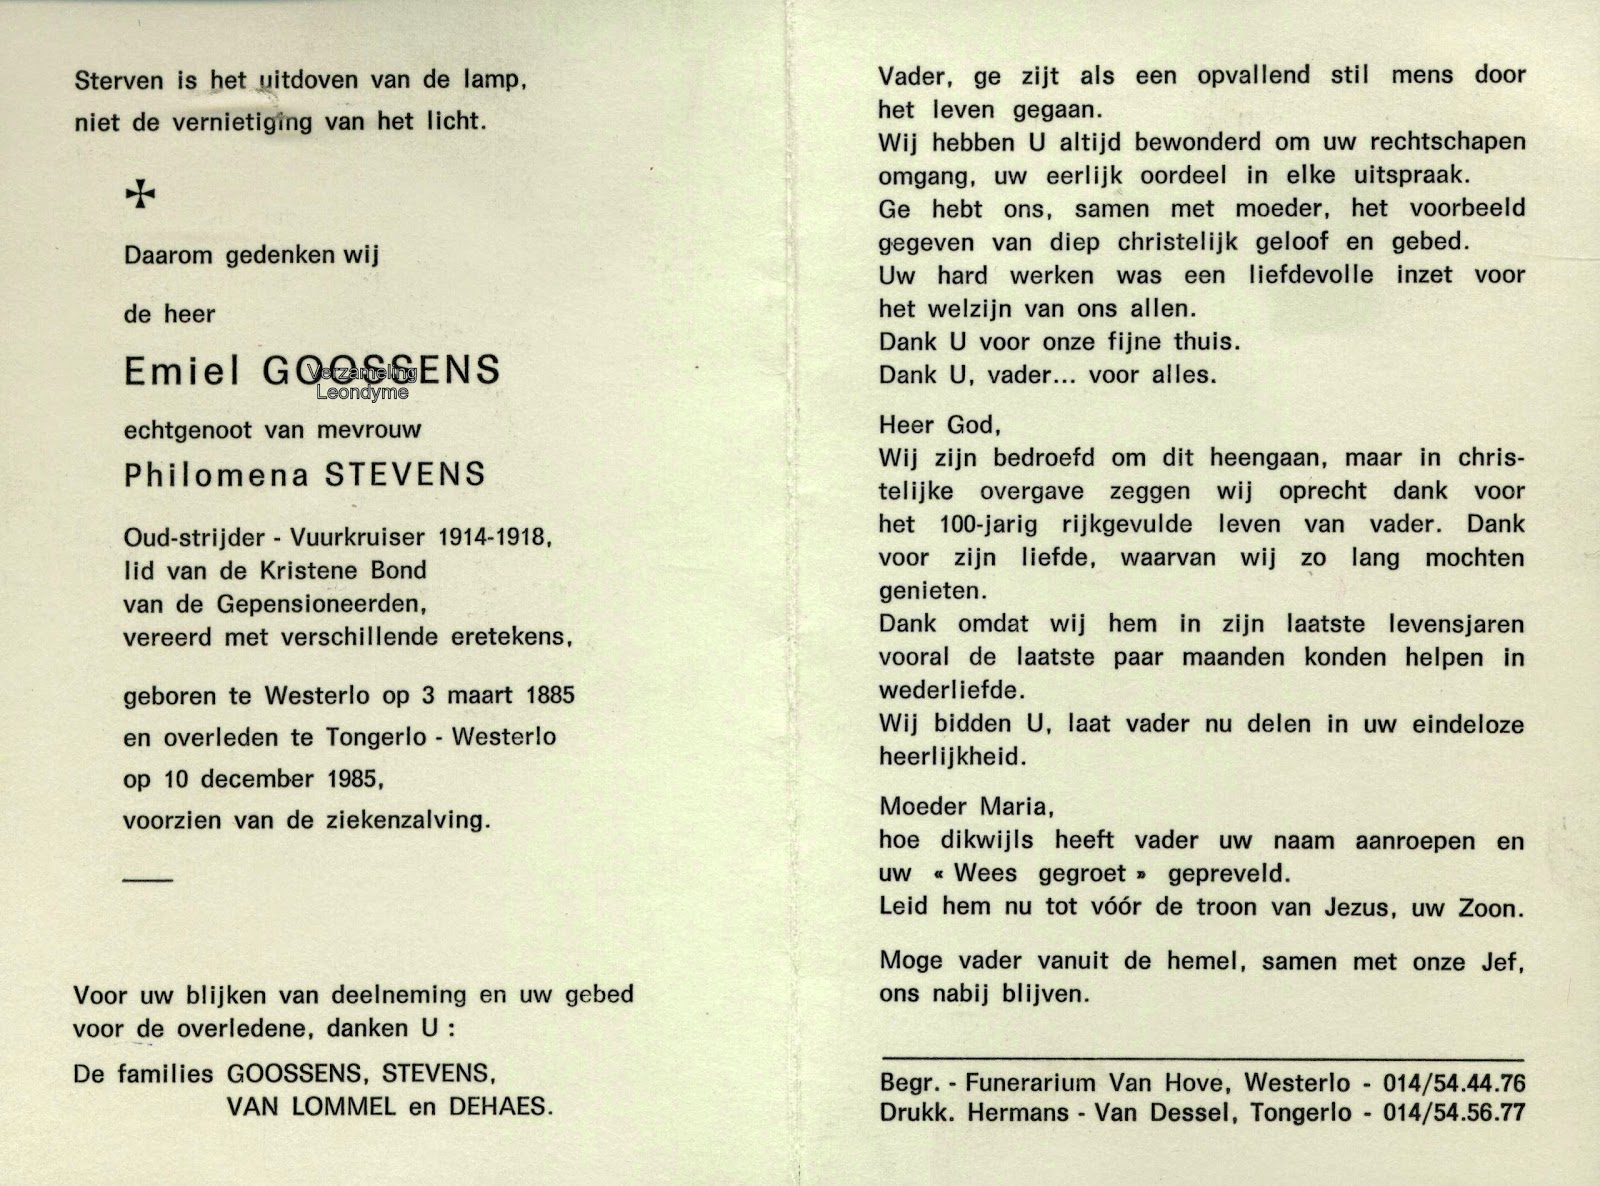 Bidprentje, oud-strijder/vuurkruiser Emiel Goossens 1885-1985. Verzameling Leondyme.